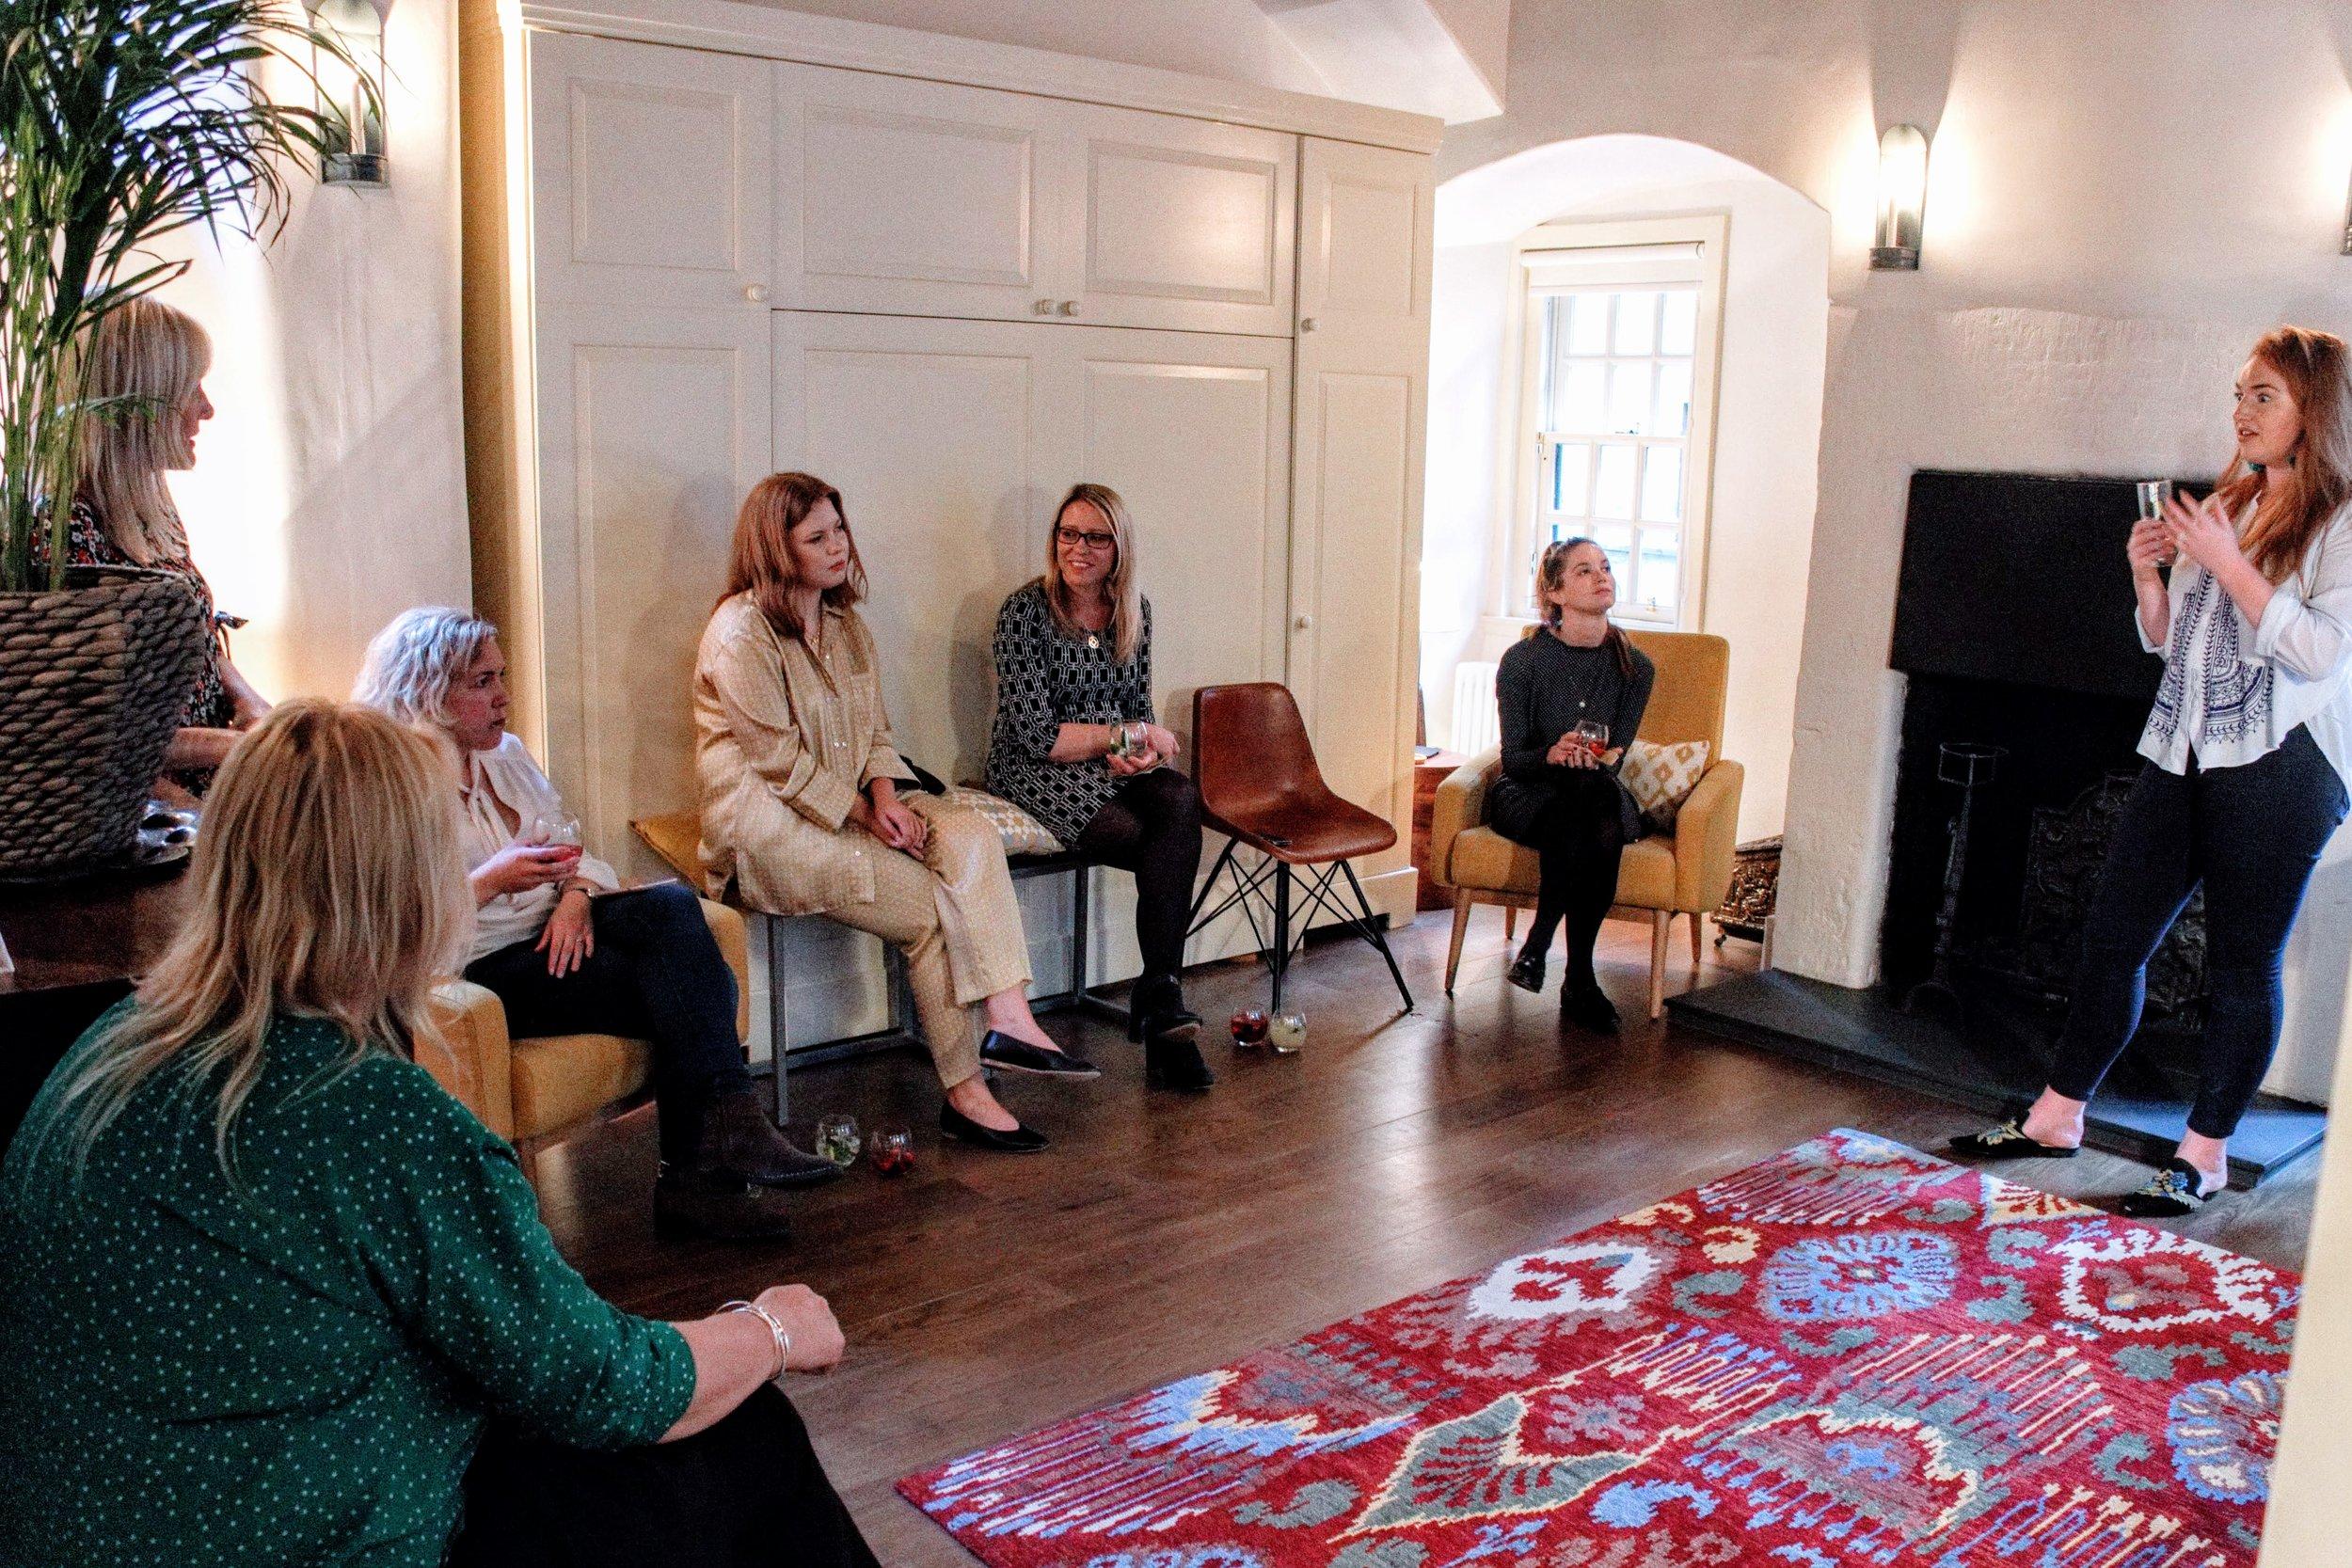 Airsorted Event June 14 - Saffron Hodgson hosting interiors talk.jpg